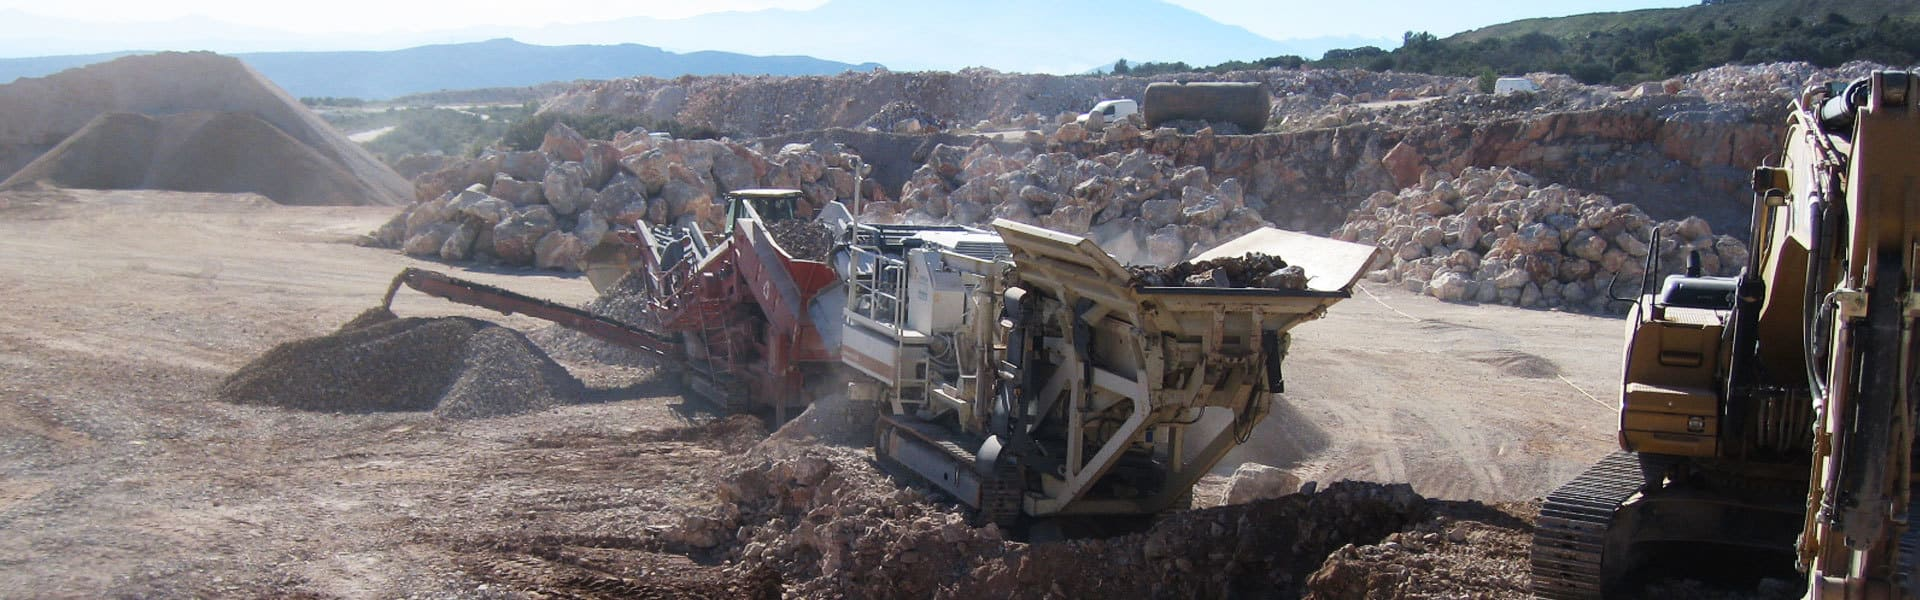 recyclage-caminal-ravalorisation-pierres-perpignan